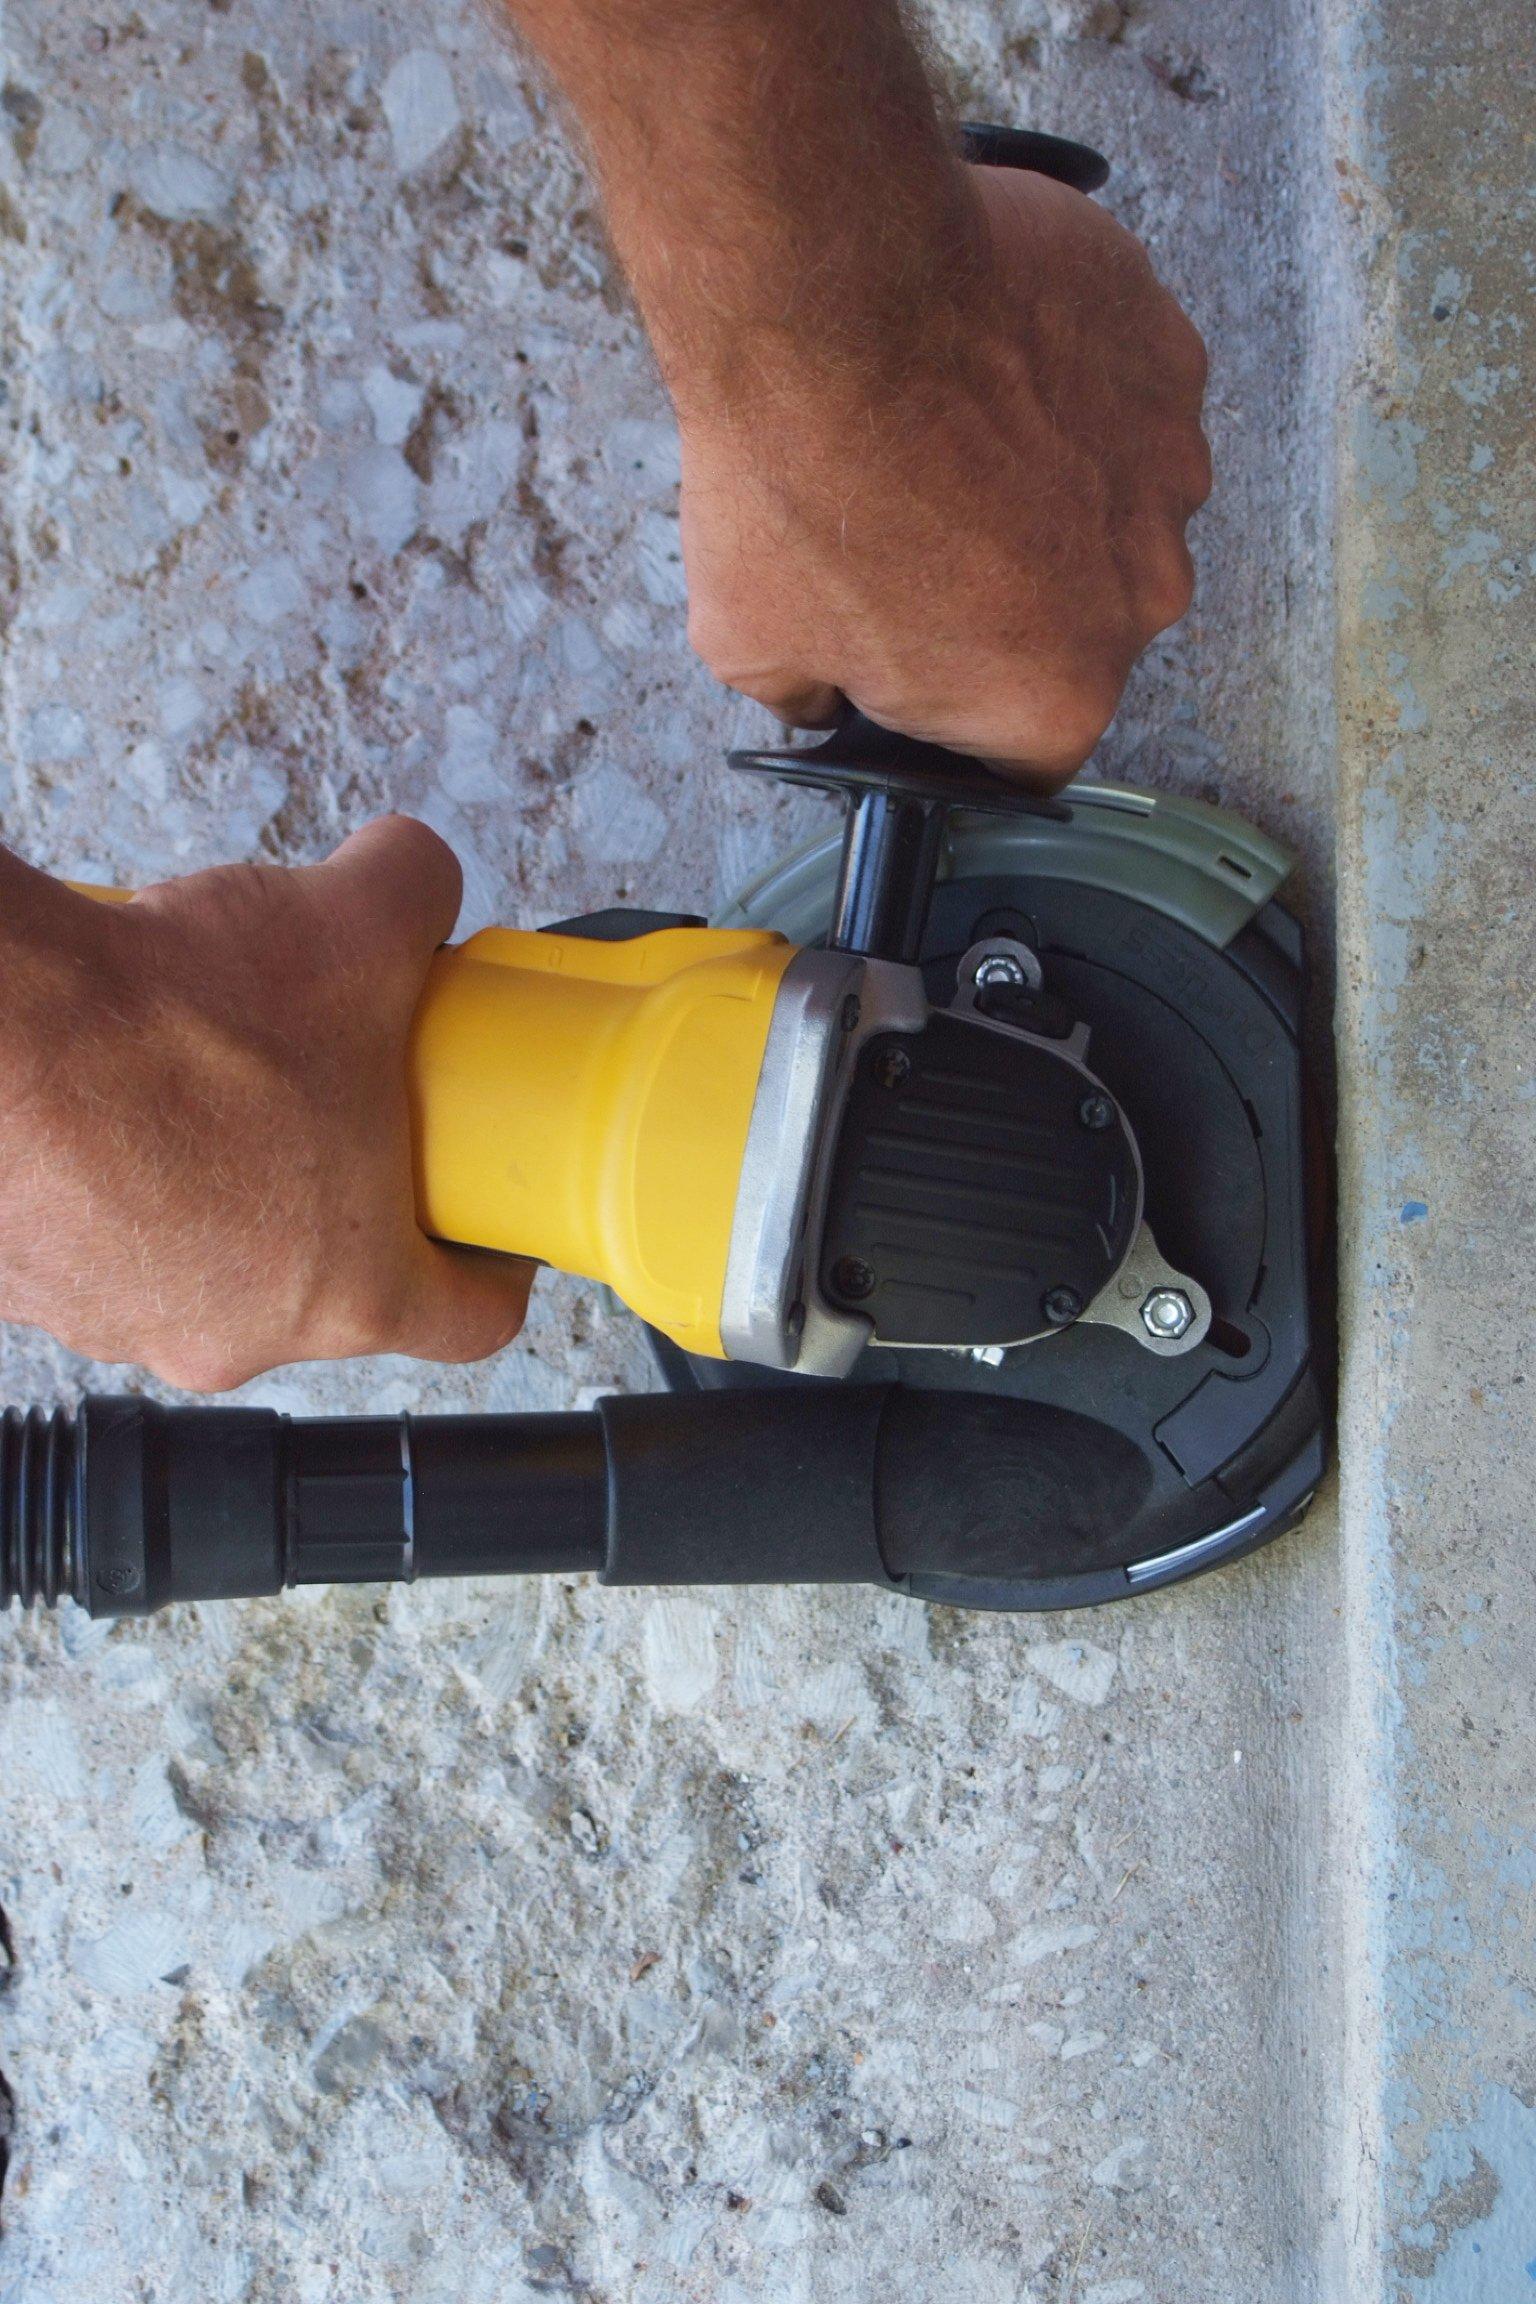 Dustless Technologies D5850 Dust Buddie XP Universal Dust Control Attachment for Grinders, 7'', Black/Gray by Dustless Technologies (Image #5)